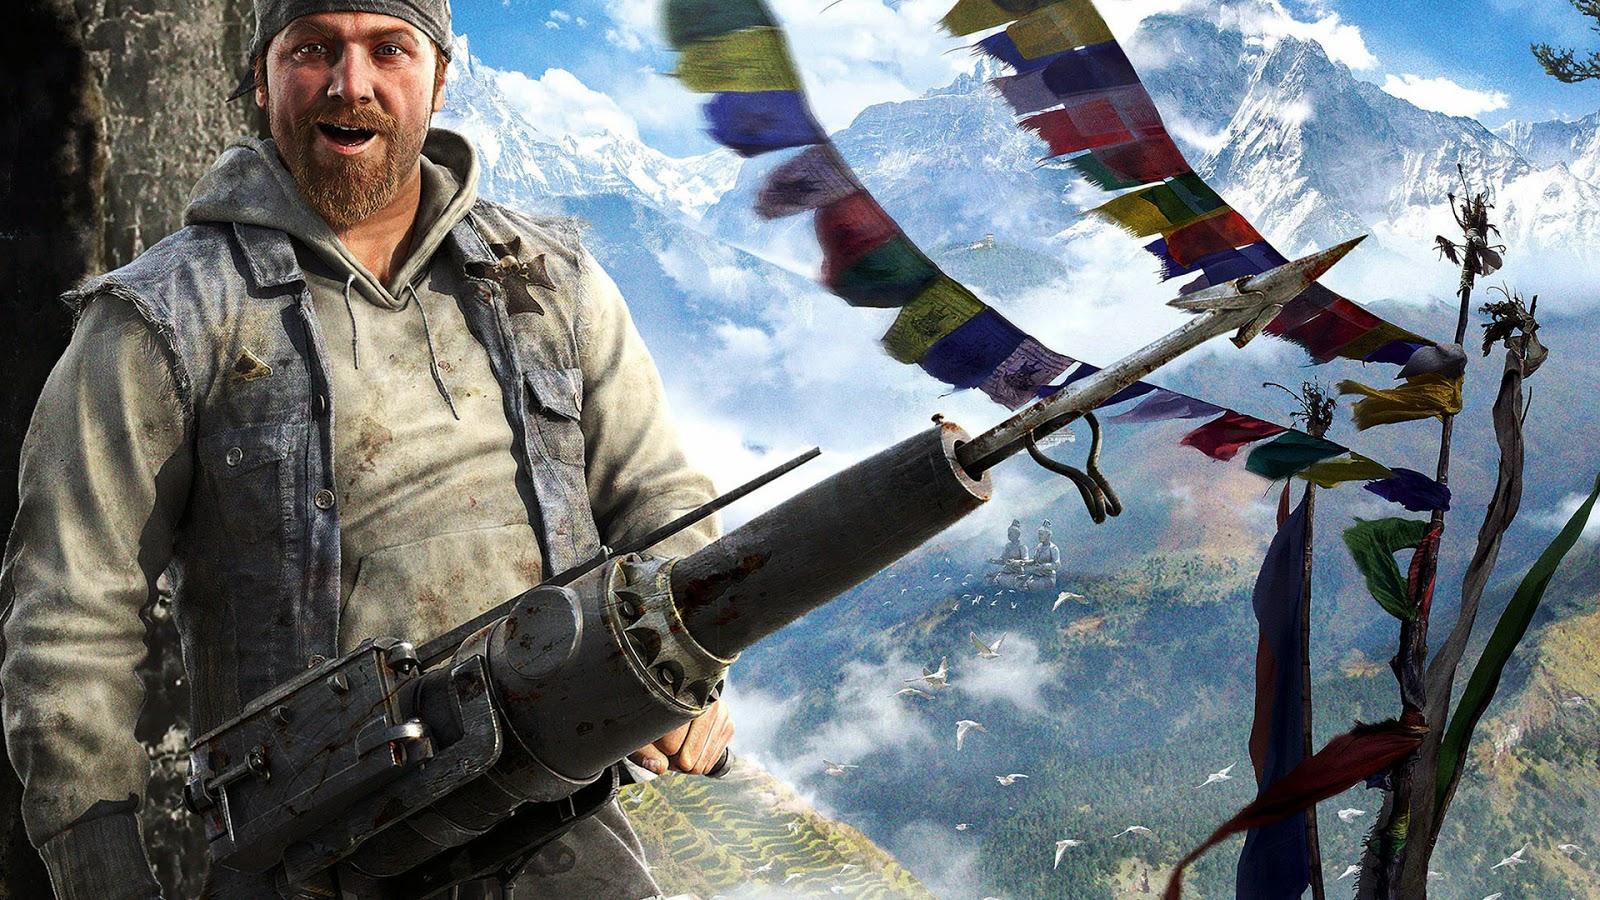 Far Cry 4 Game Wallpaper